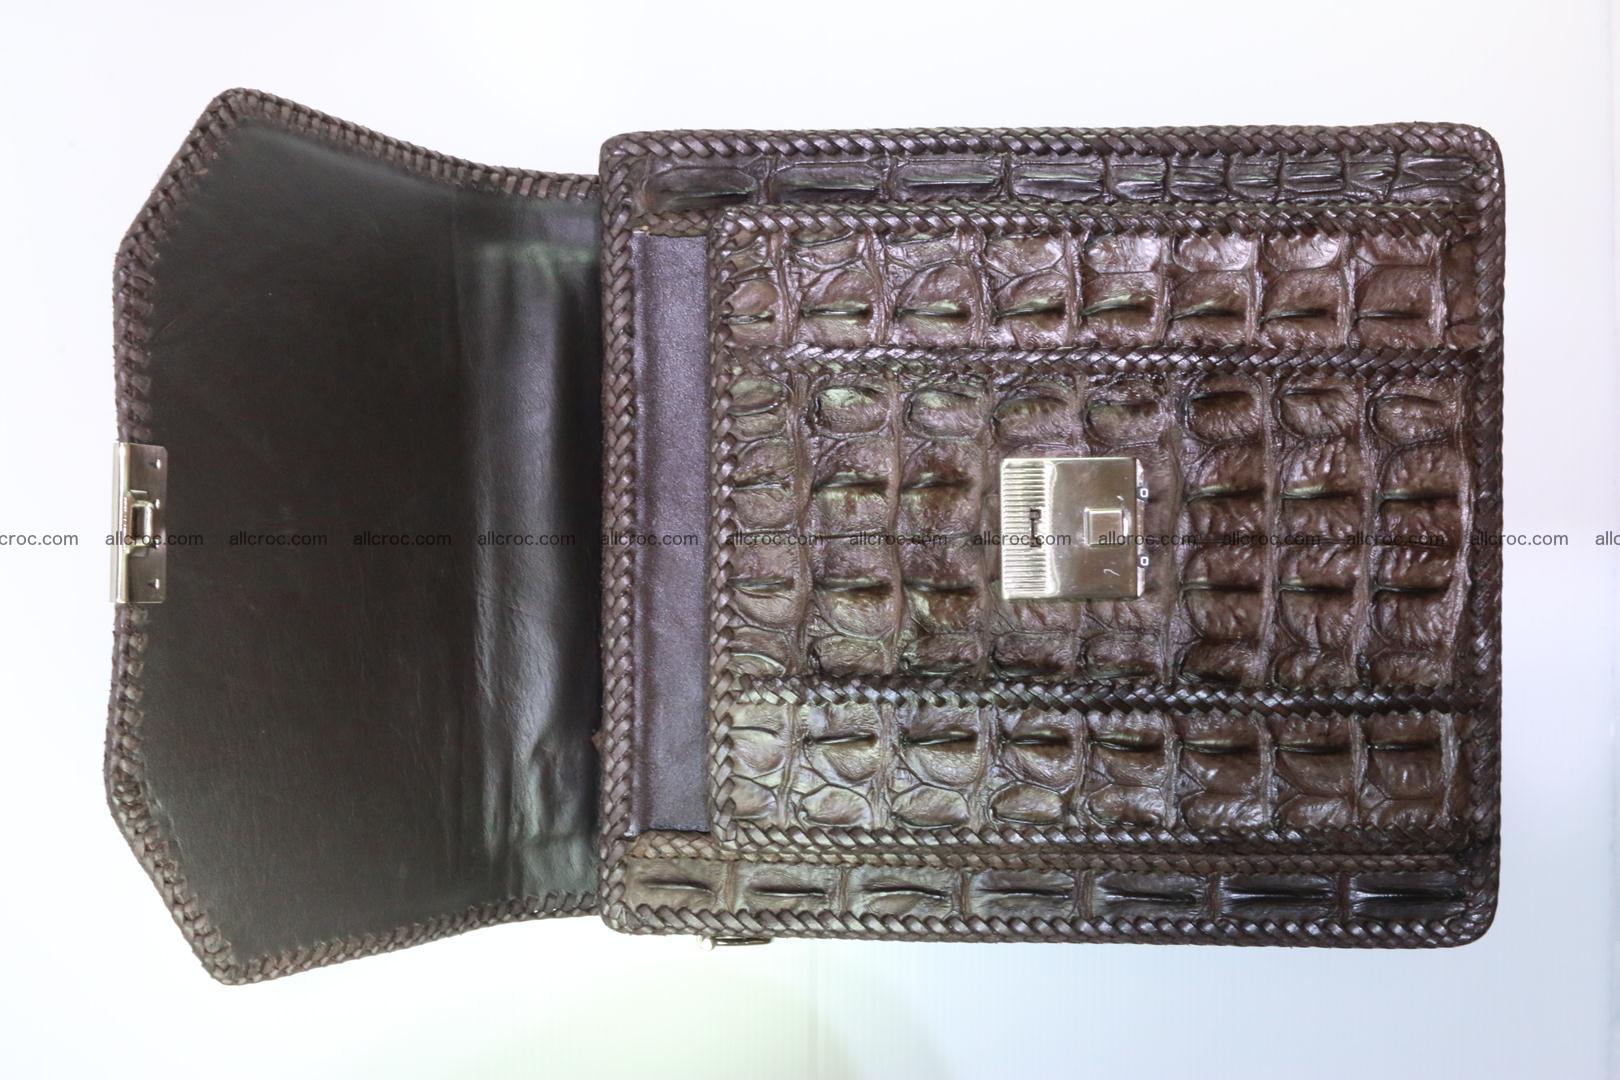 Crocodile skin messenger bag braided edges 138 Foto 9